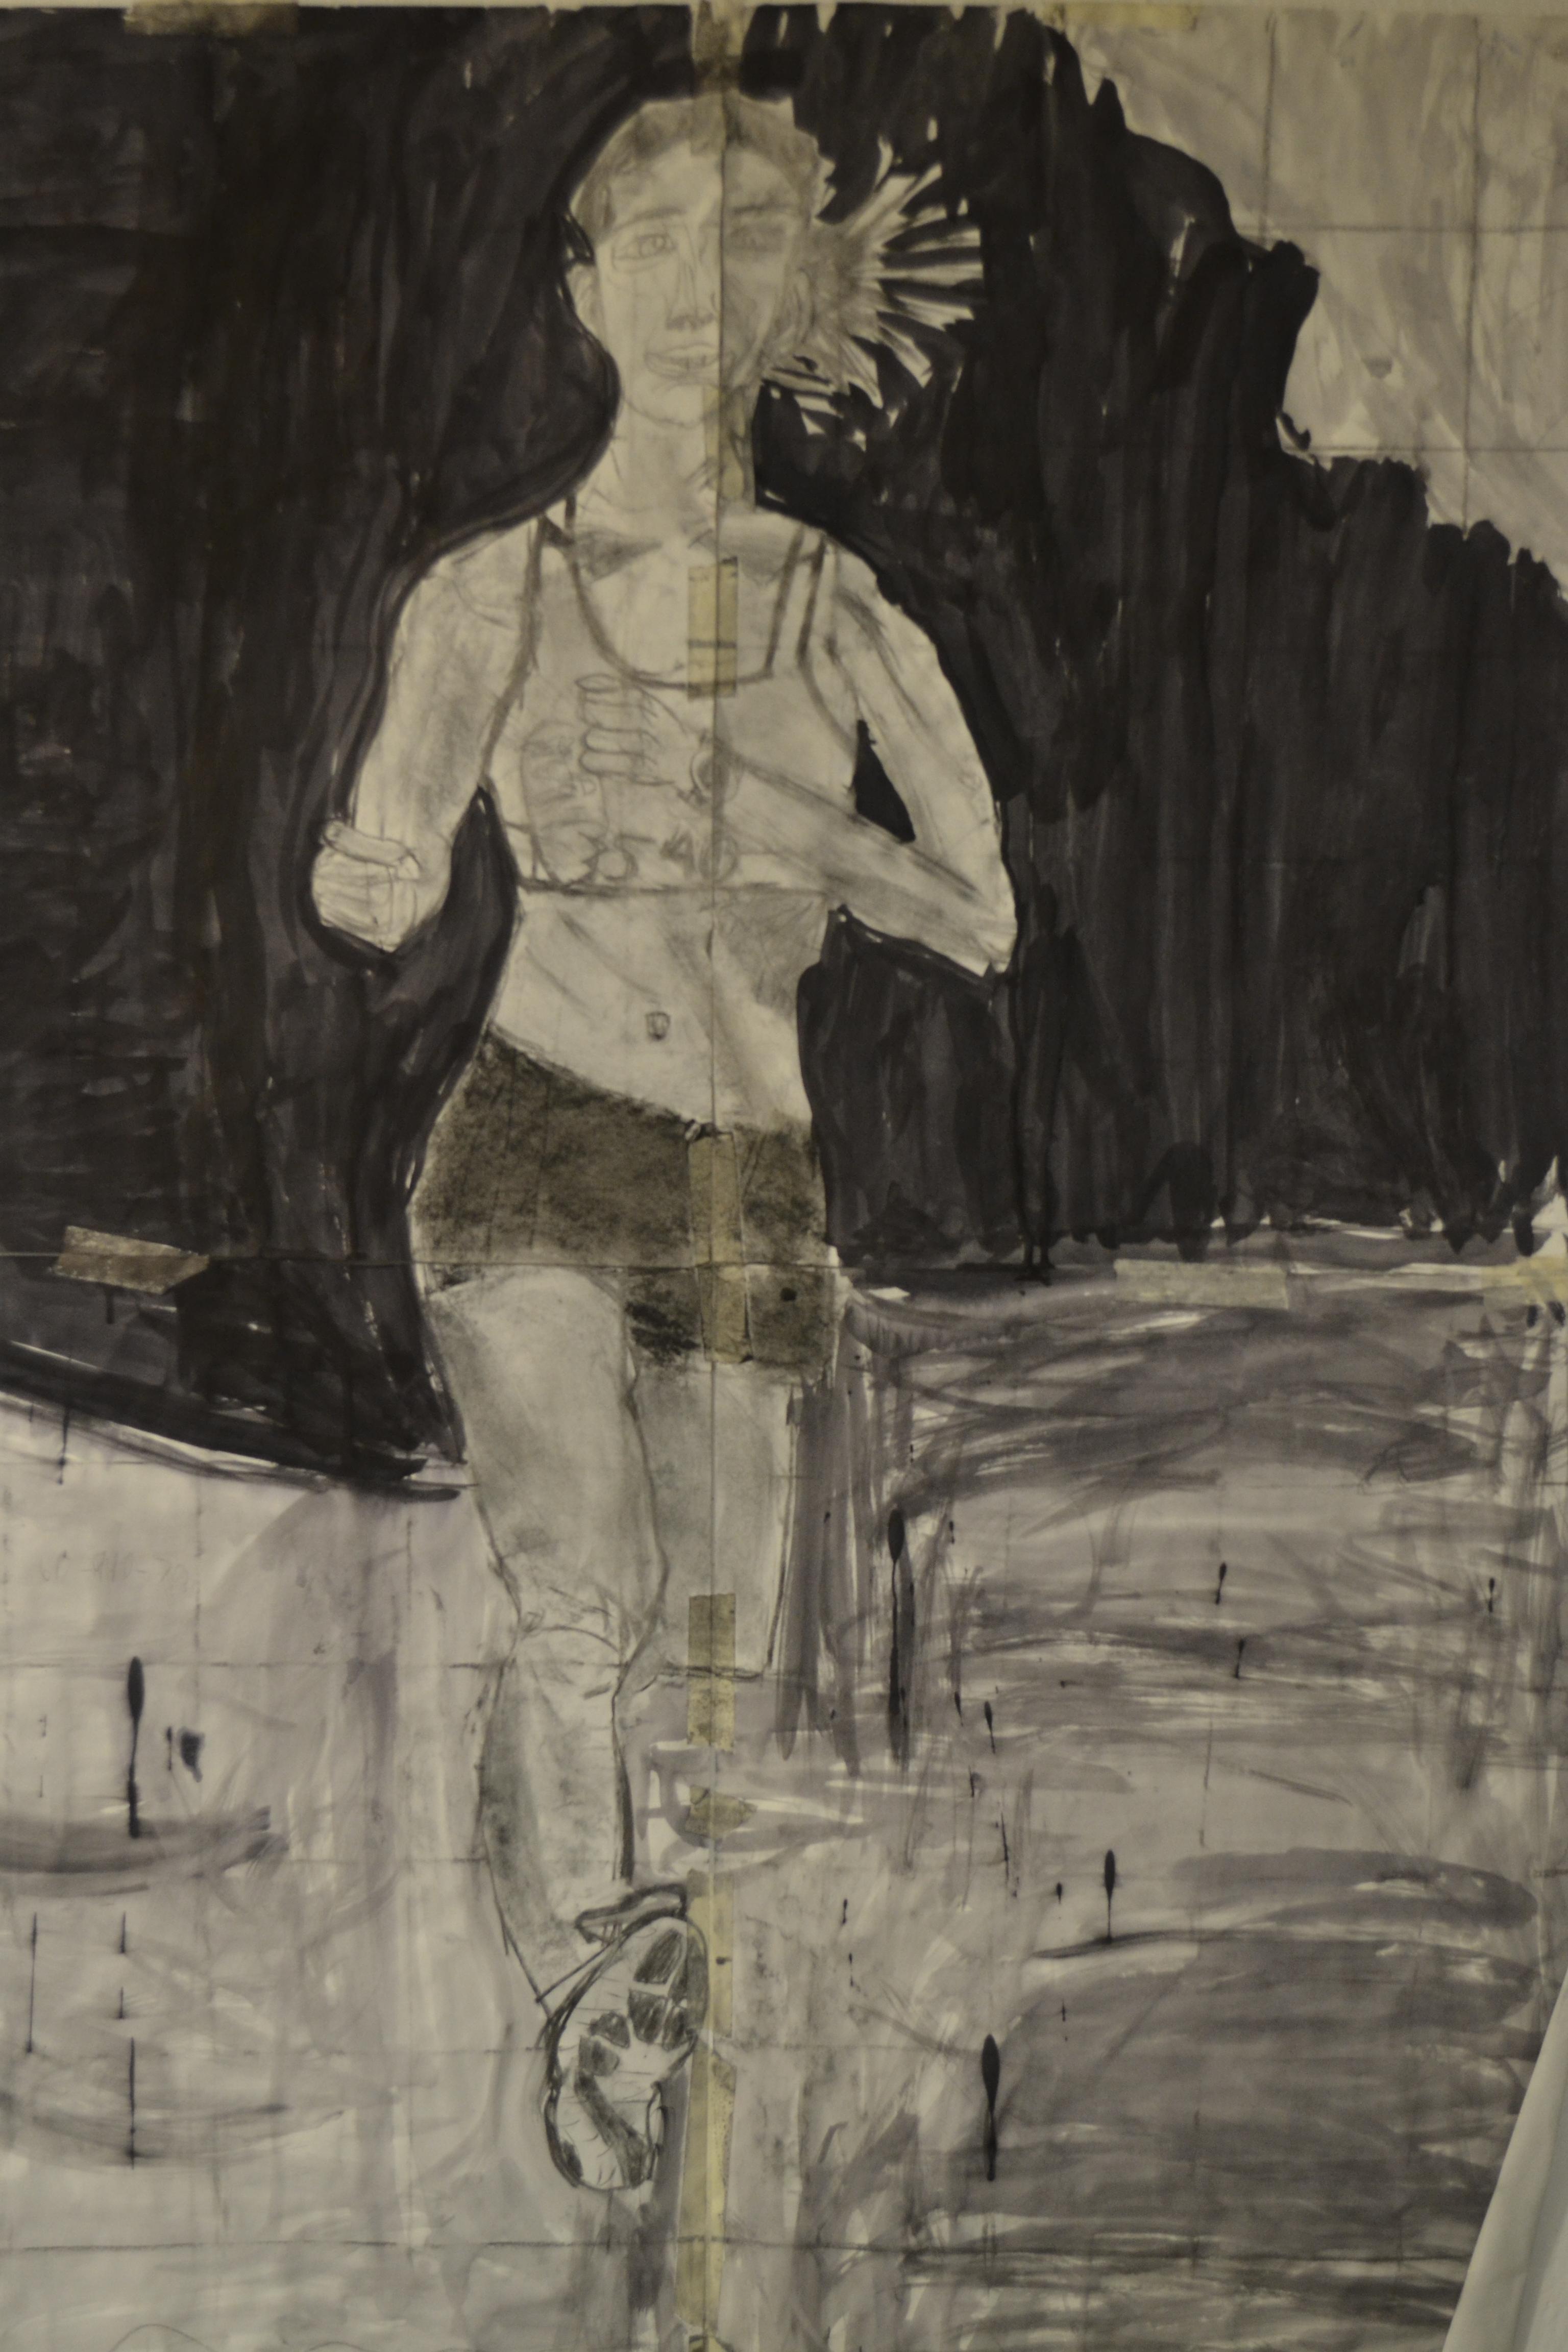 Woman Runner (forward)